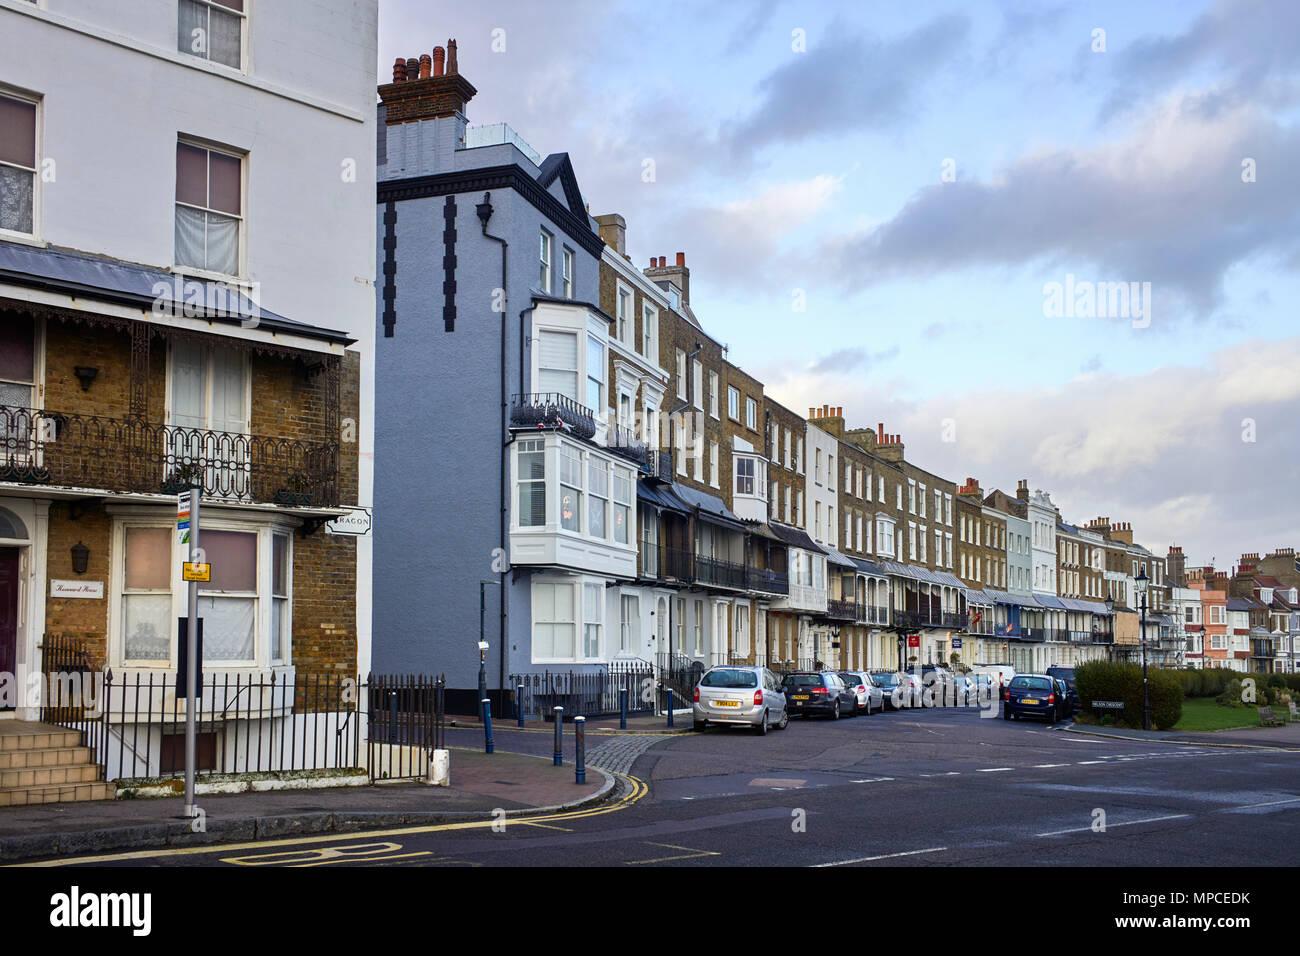 Georgian buildings in Nelson Crescent in Ramsgate, Kent - Stock Image